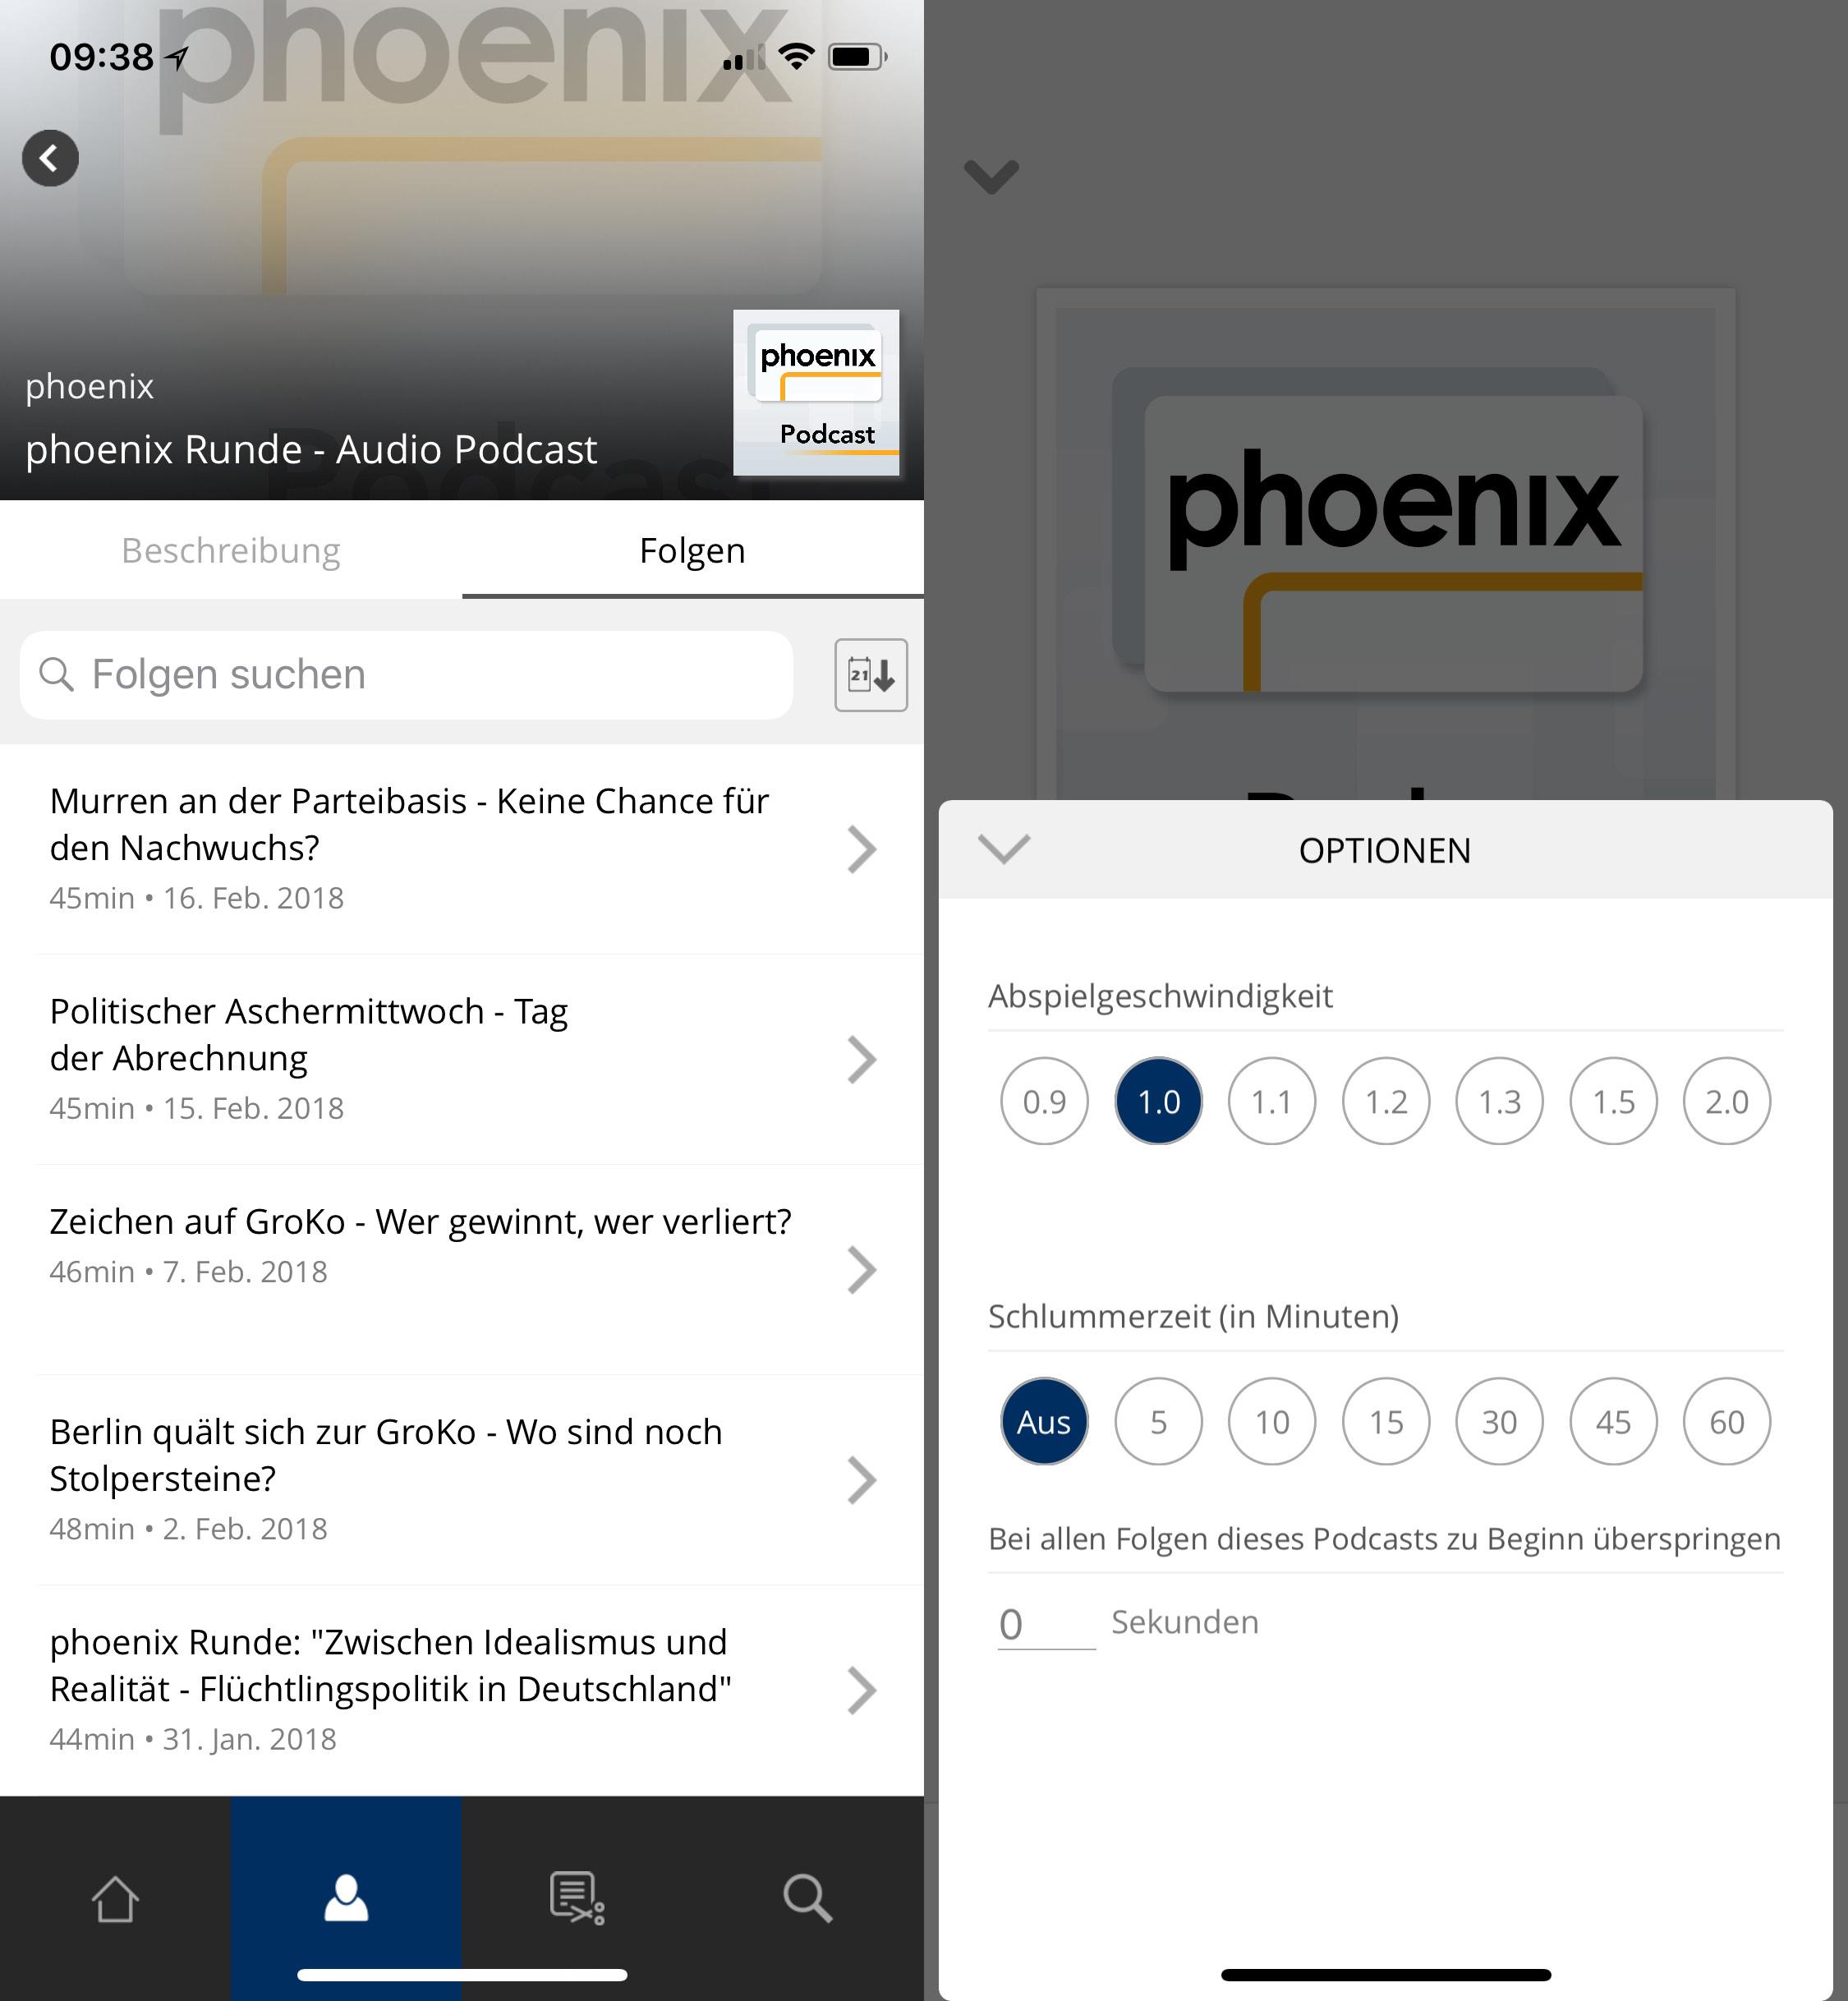 Procast Phonix